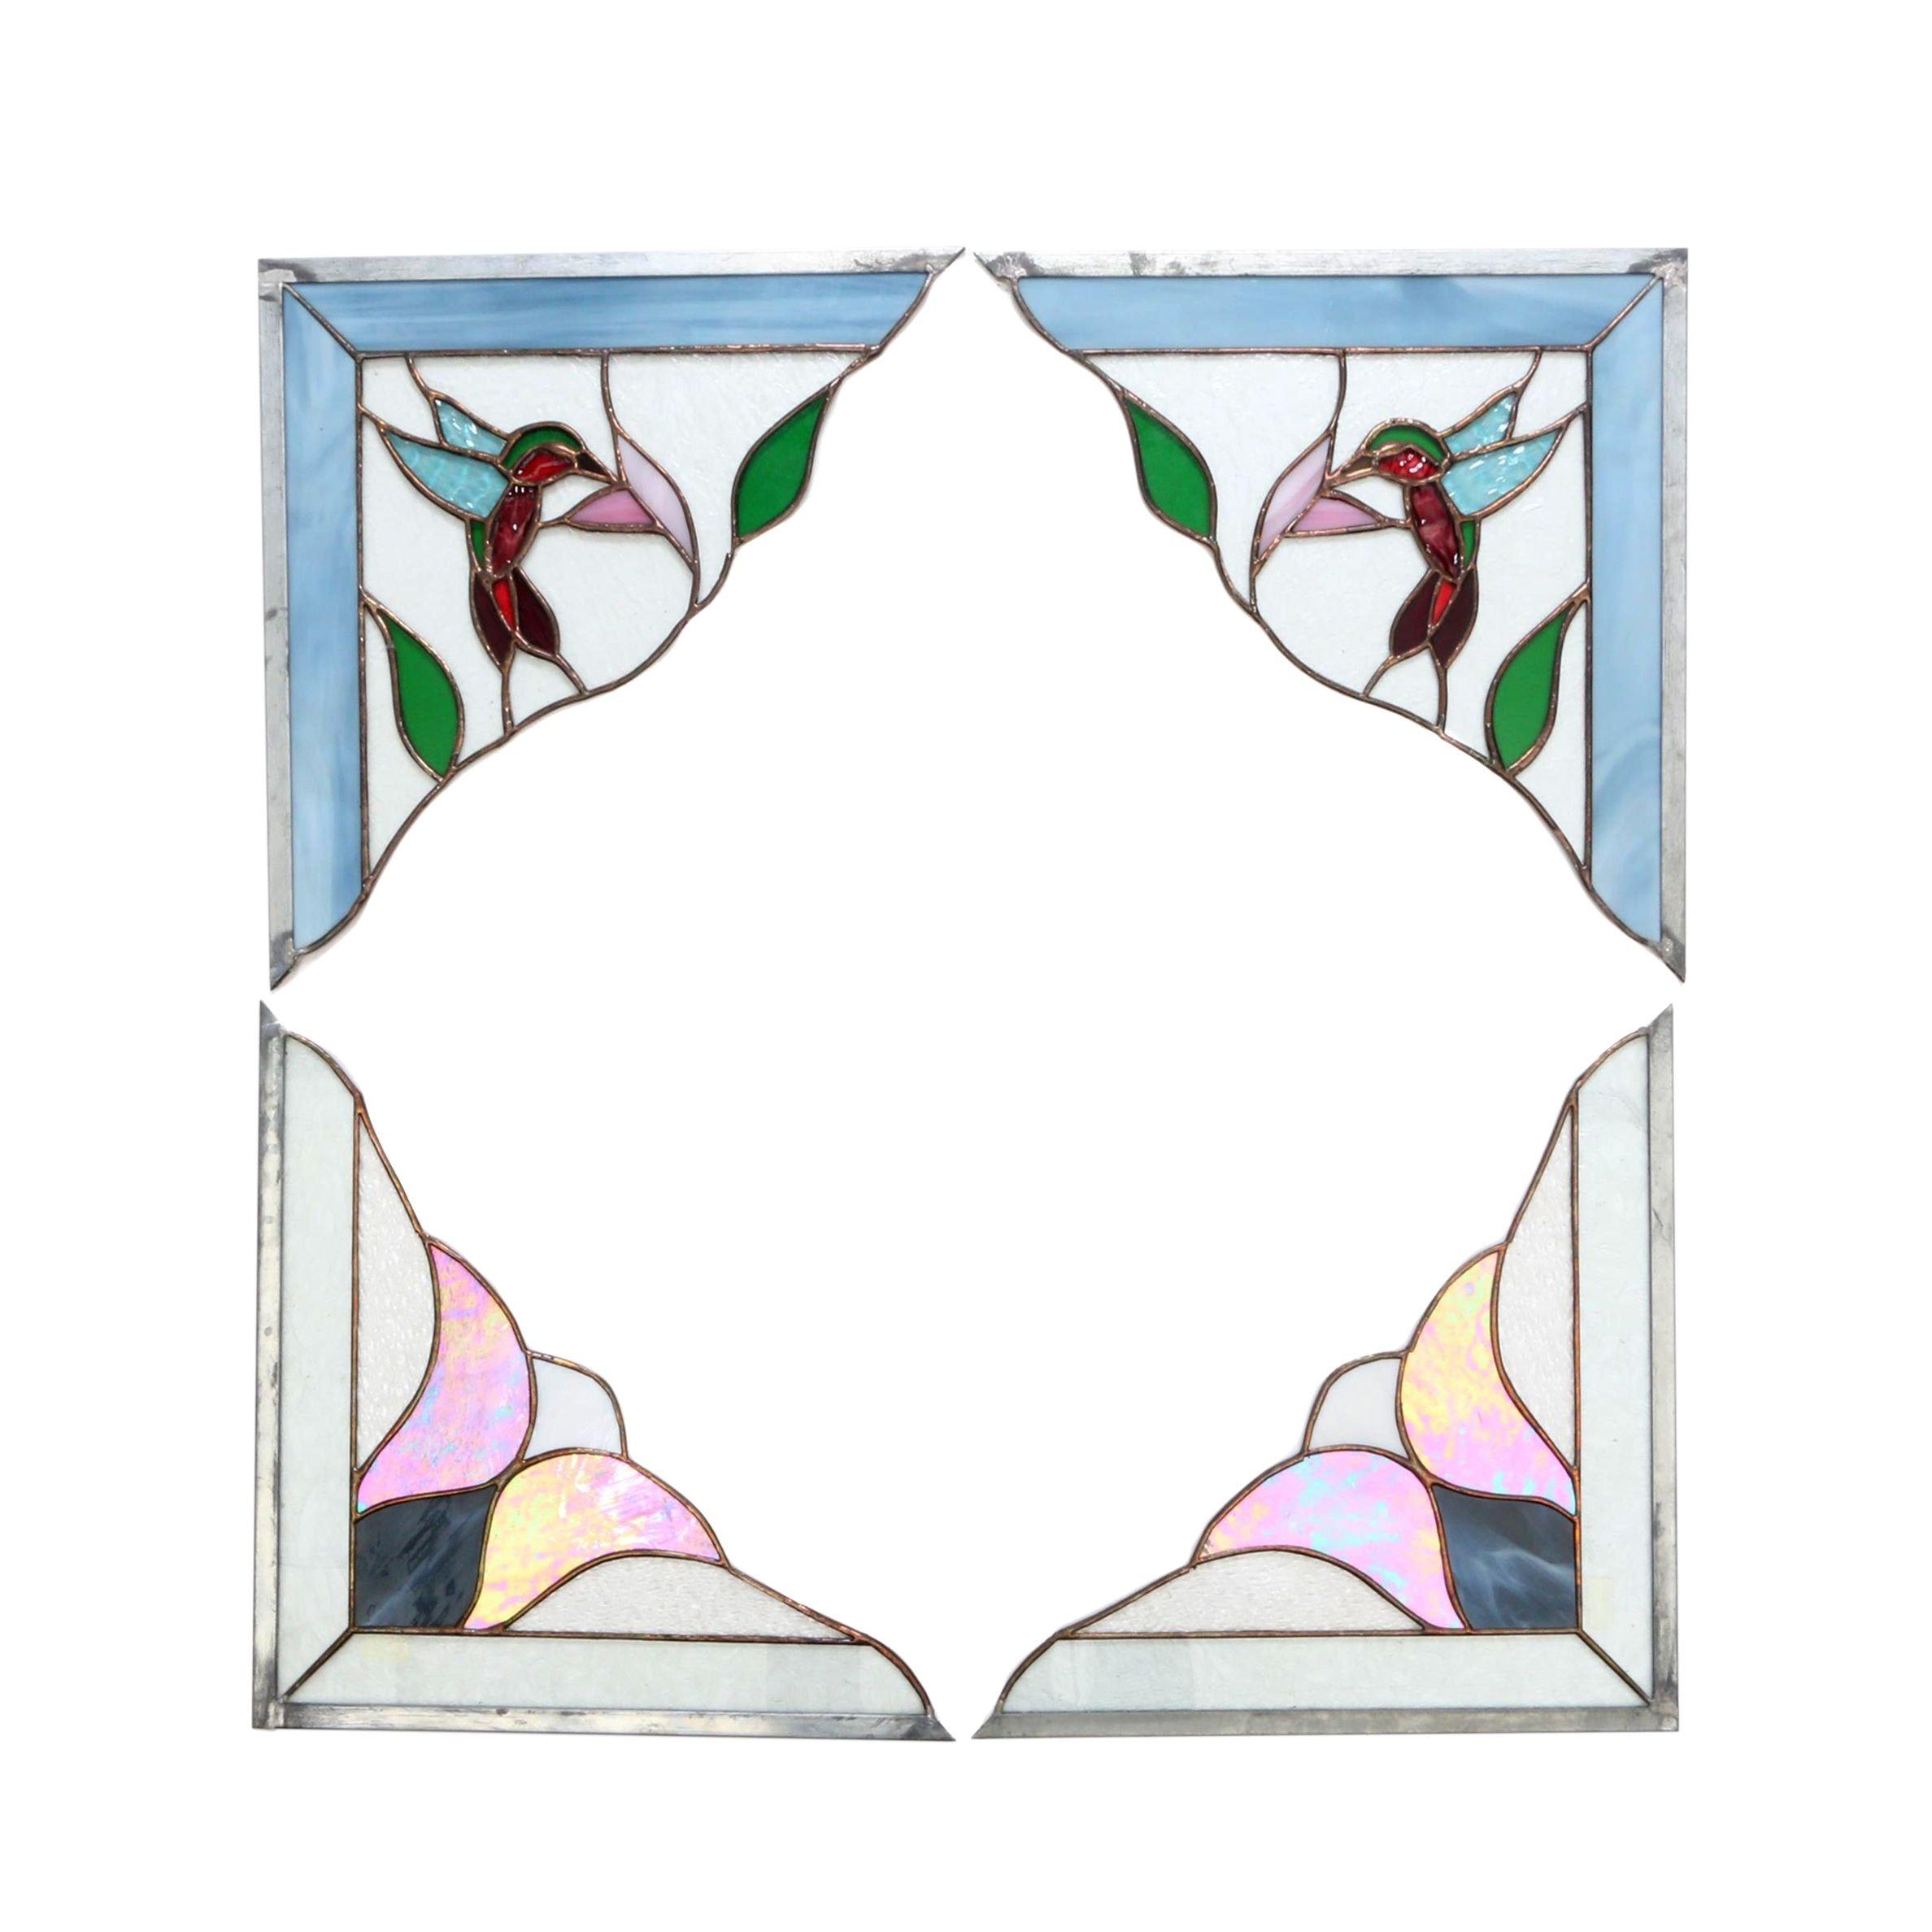 Slag Glass Corner Panels by Schuster Studios